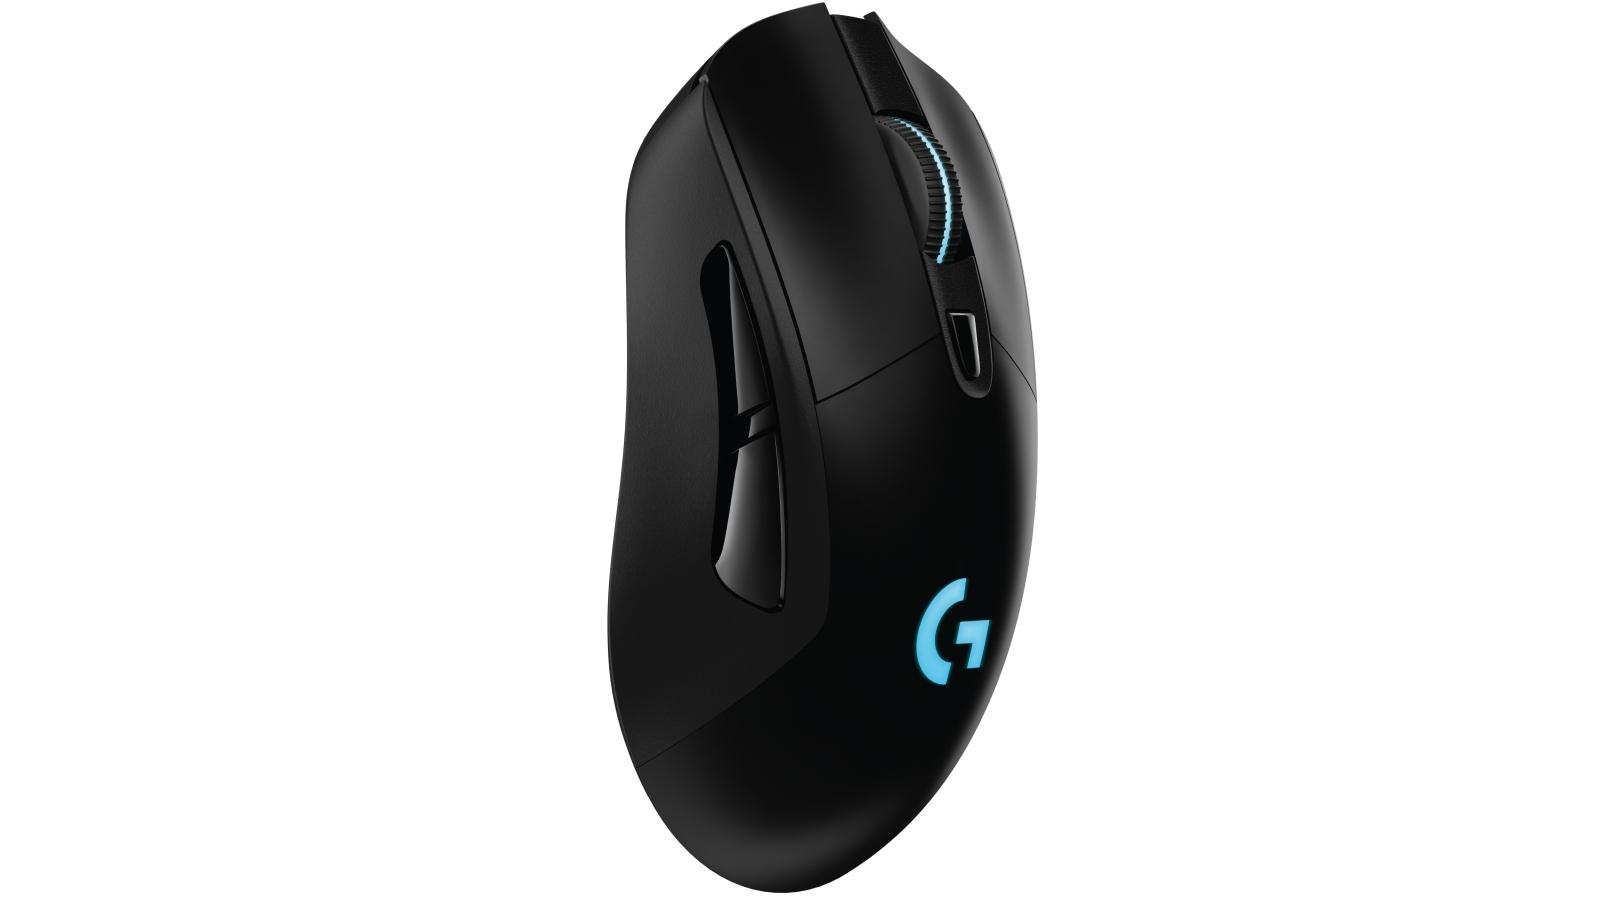 Buy Logitech G703 Lightspeed Wireless Gaming Mouse - Black | Harvey